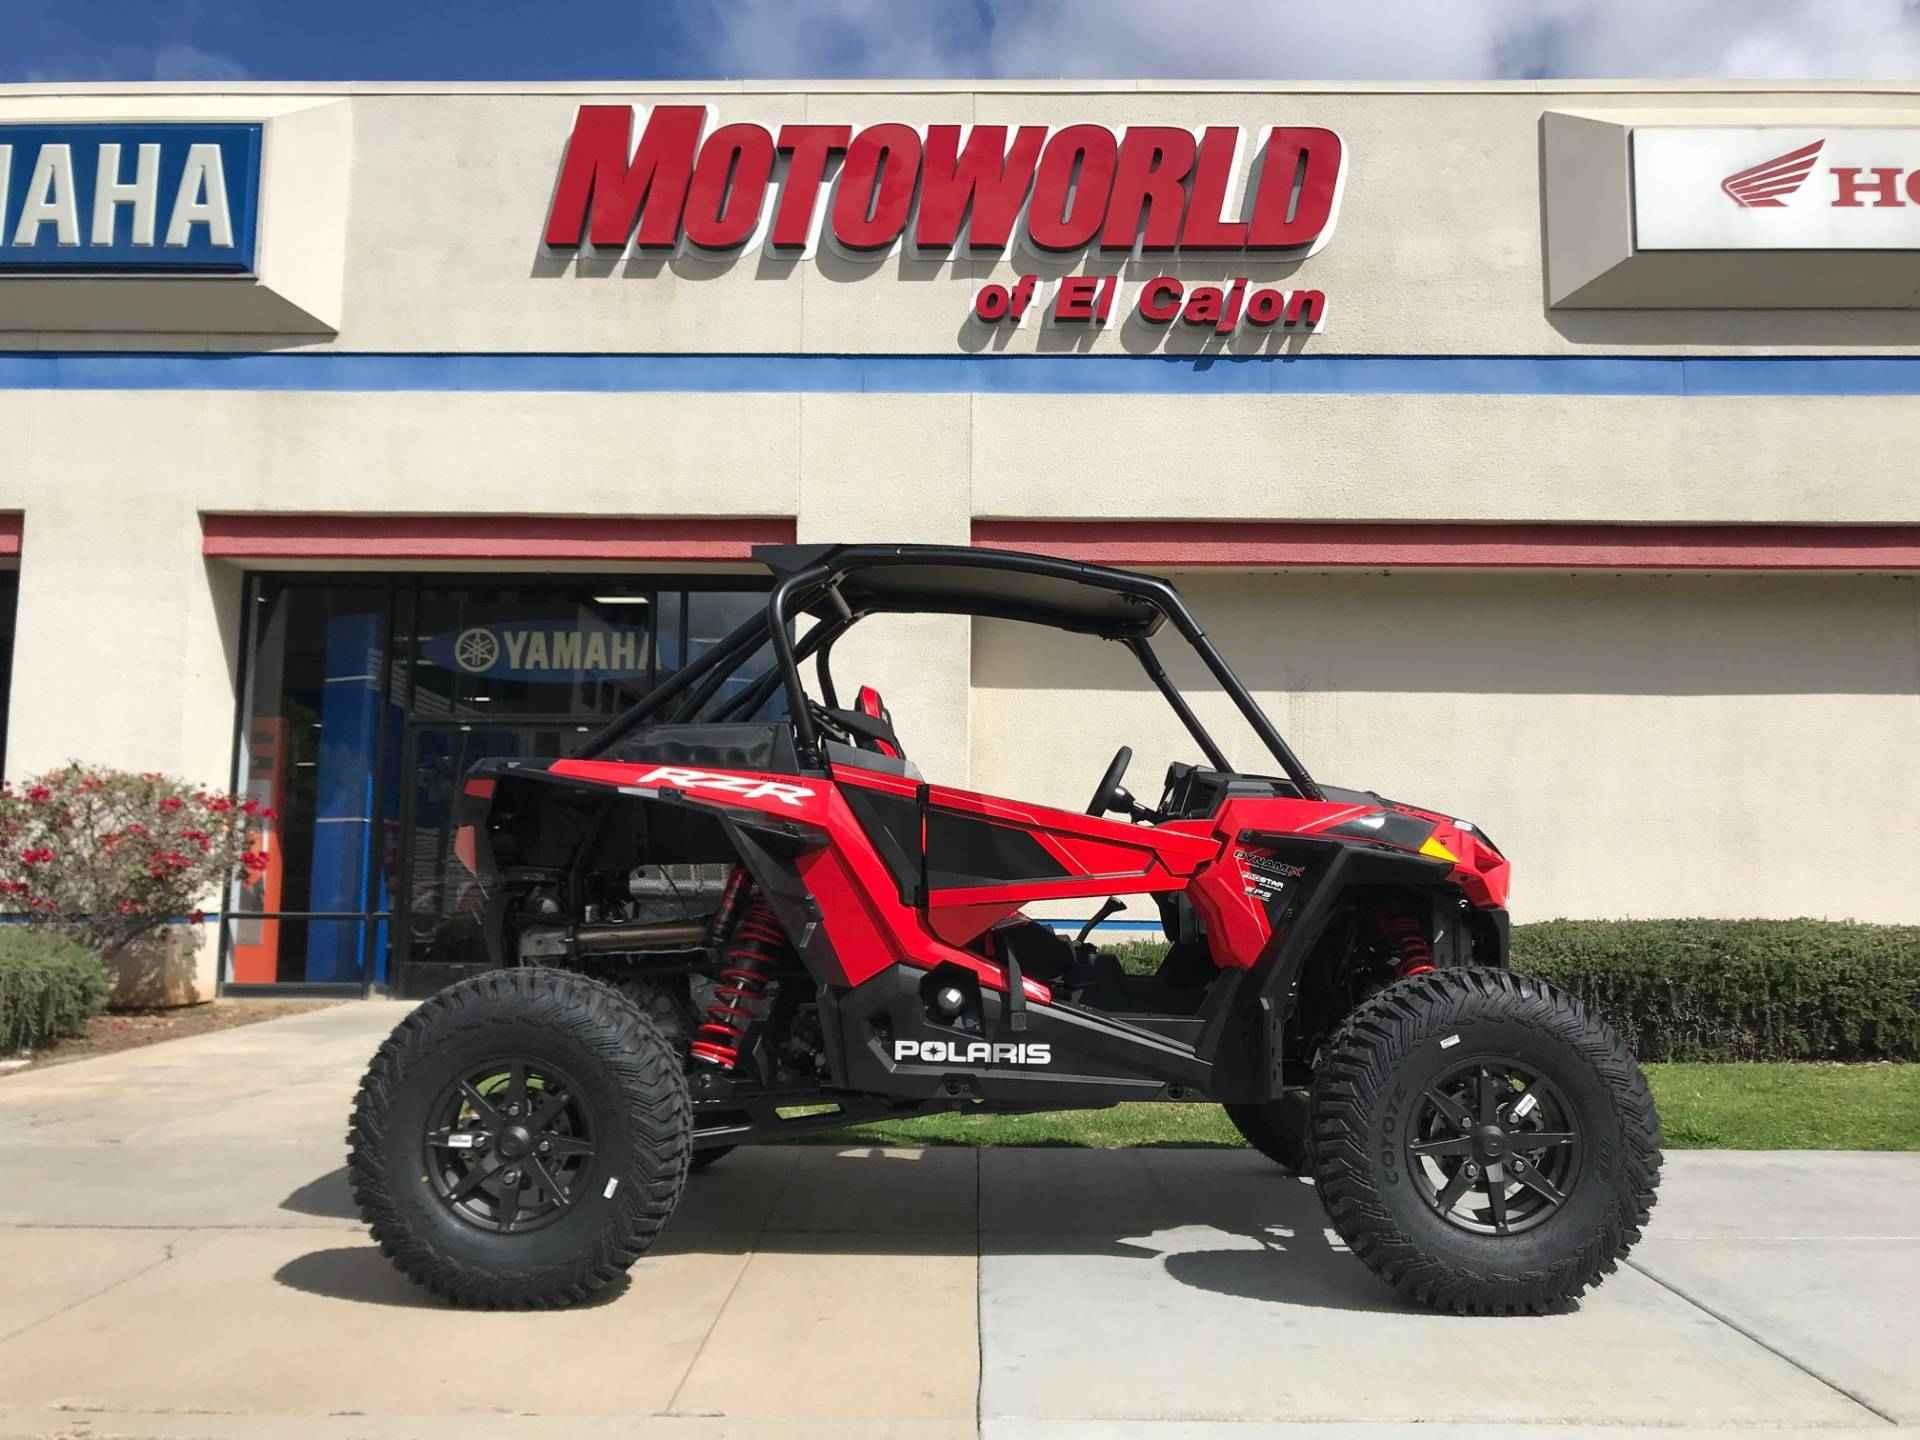 Polaris Rzr For Sale Tennessee >> New 2018 Polaris RZR XP Turbo S ATVs For Sale in California on ATV Trades